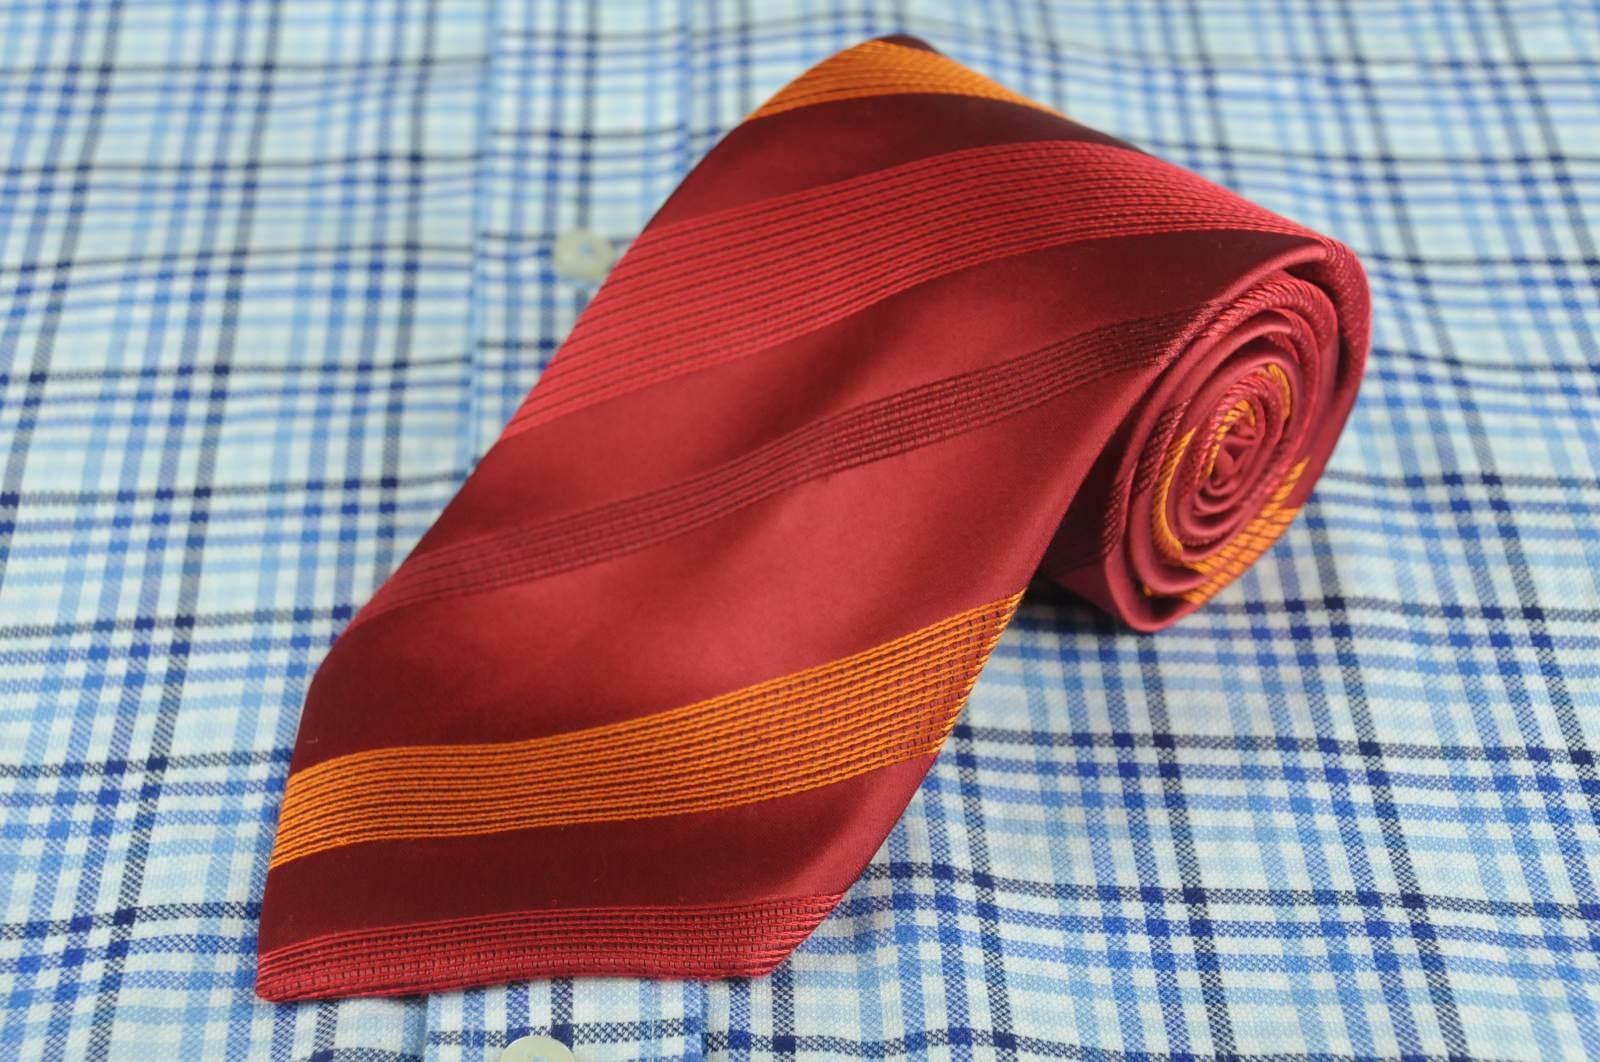 Kenneth Cole Men's Tie Ruby & Orange Striped Woven Silk Necktie 60 x 3.5 in.